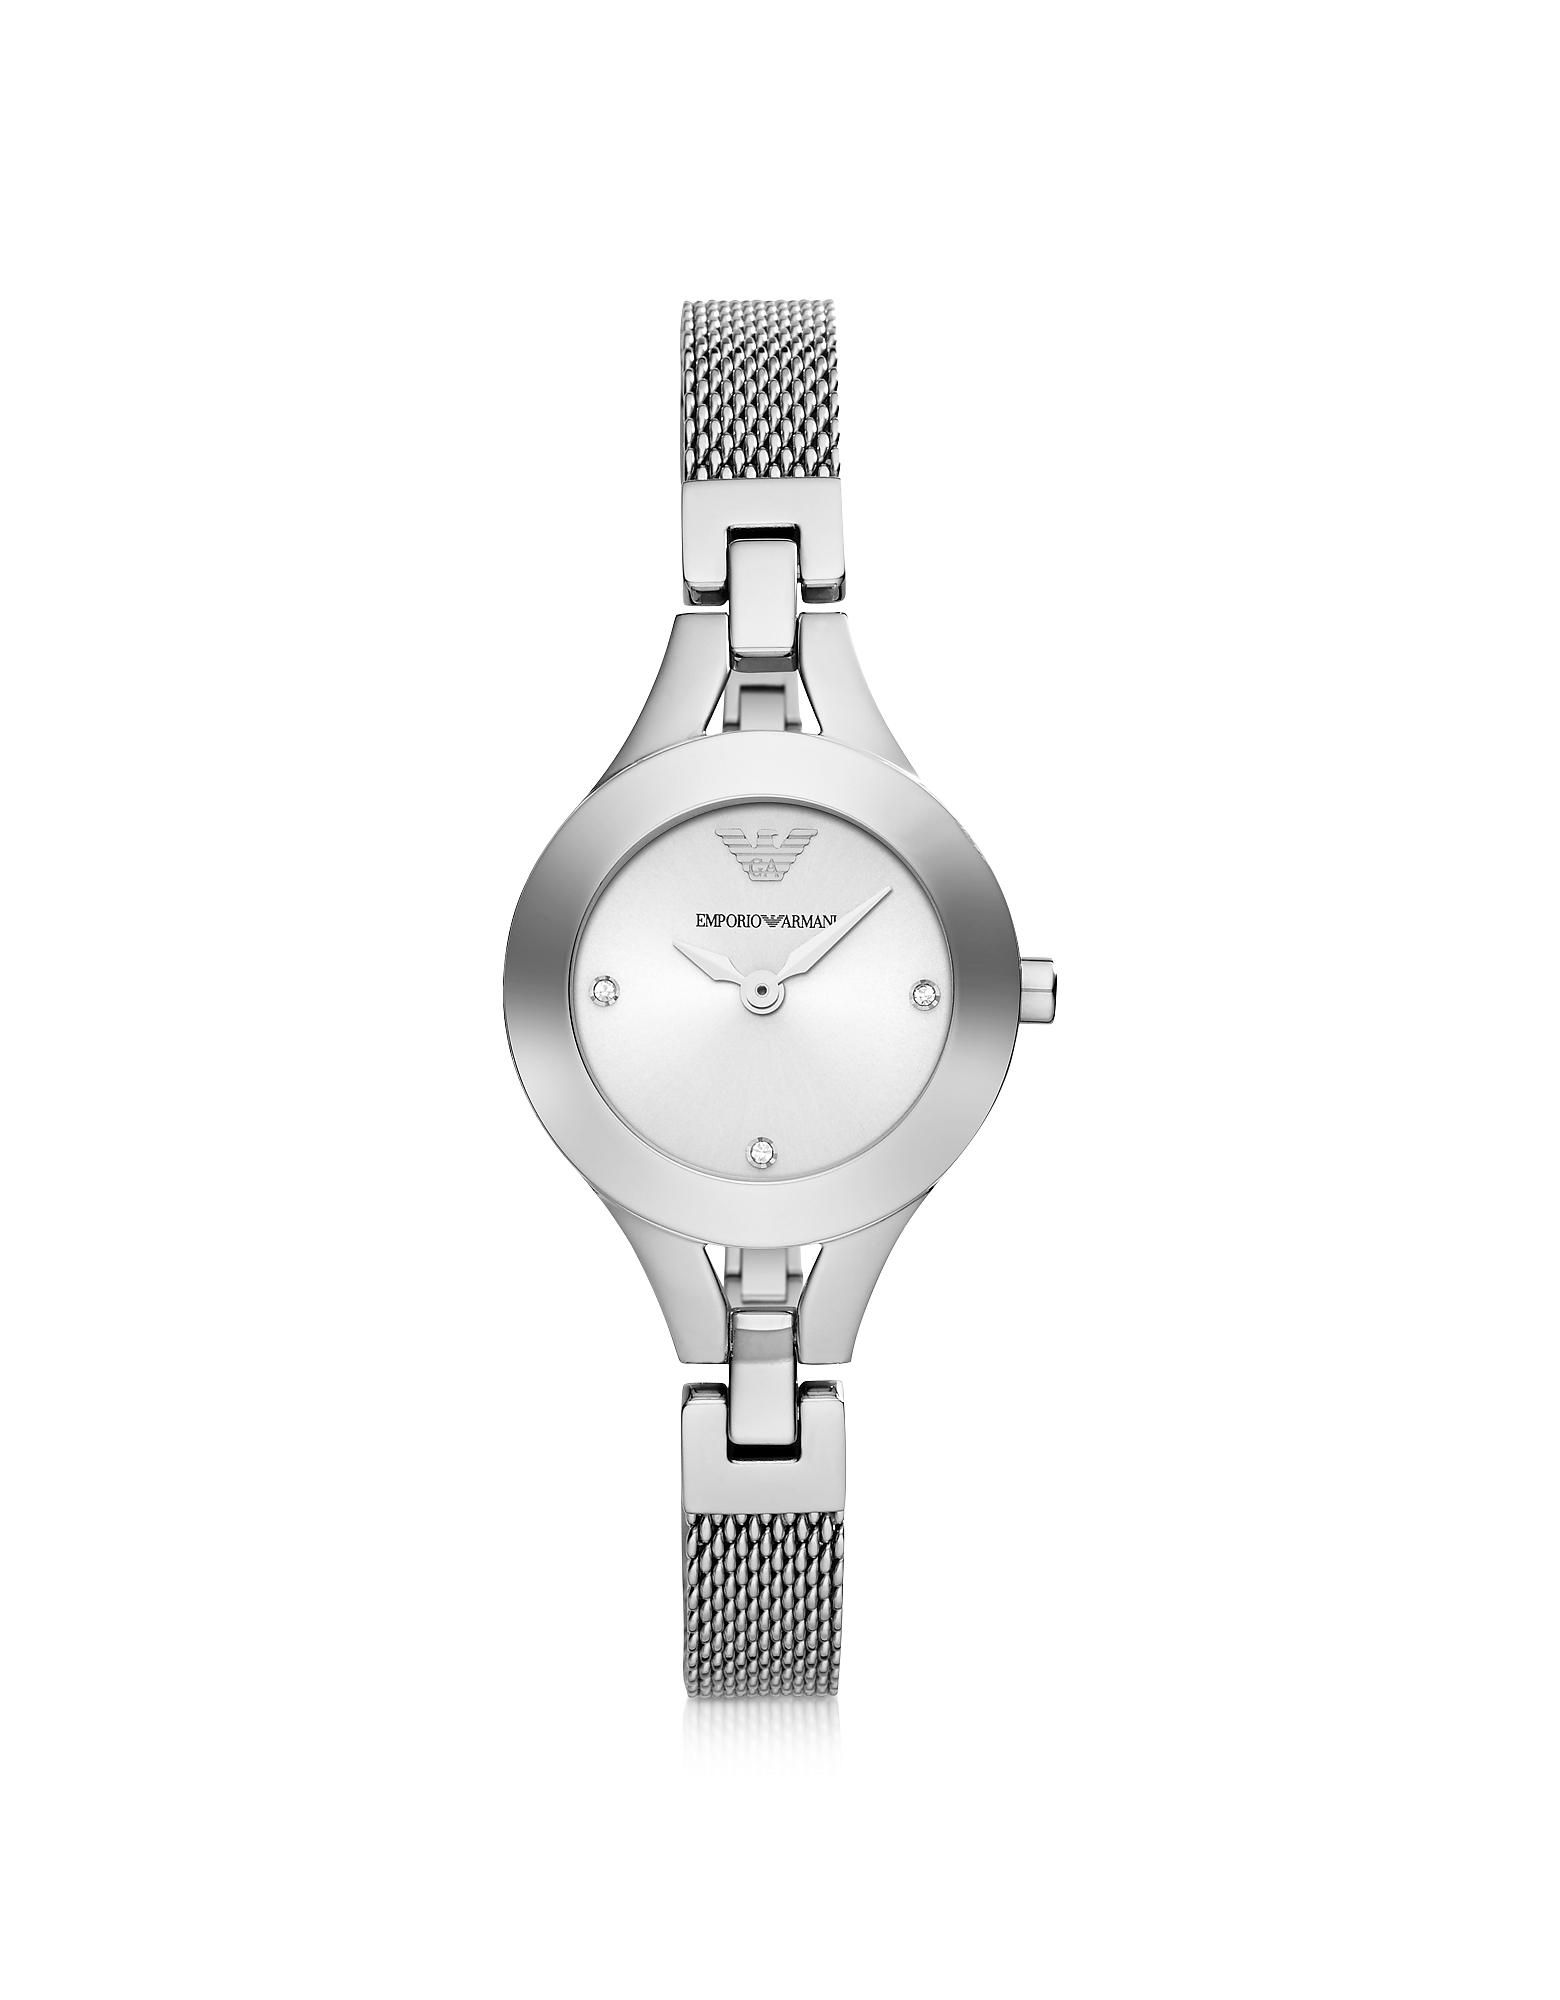 Emporio Armani Women's Watches, Classic Sleek Stainless Steel Women's Watch